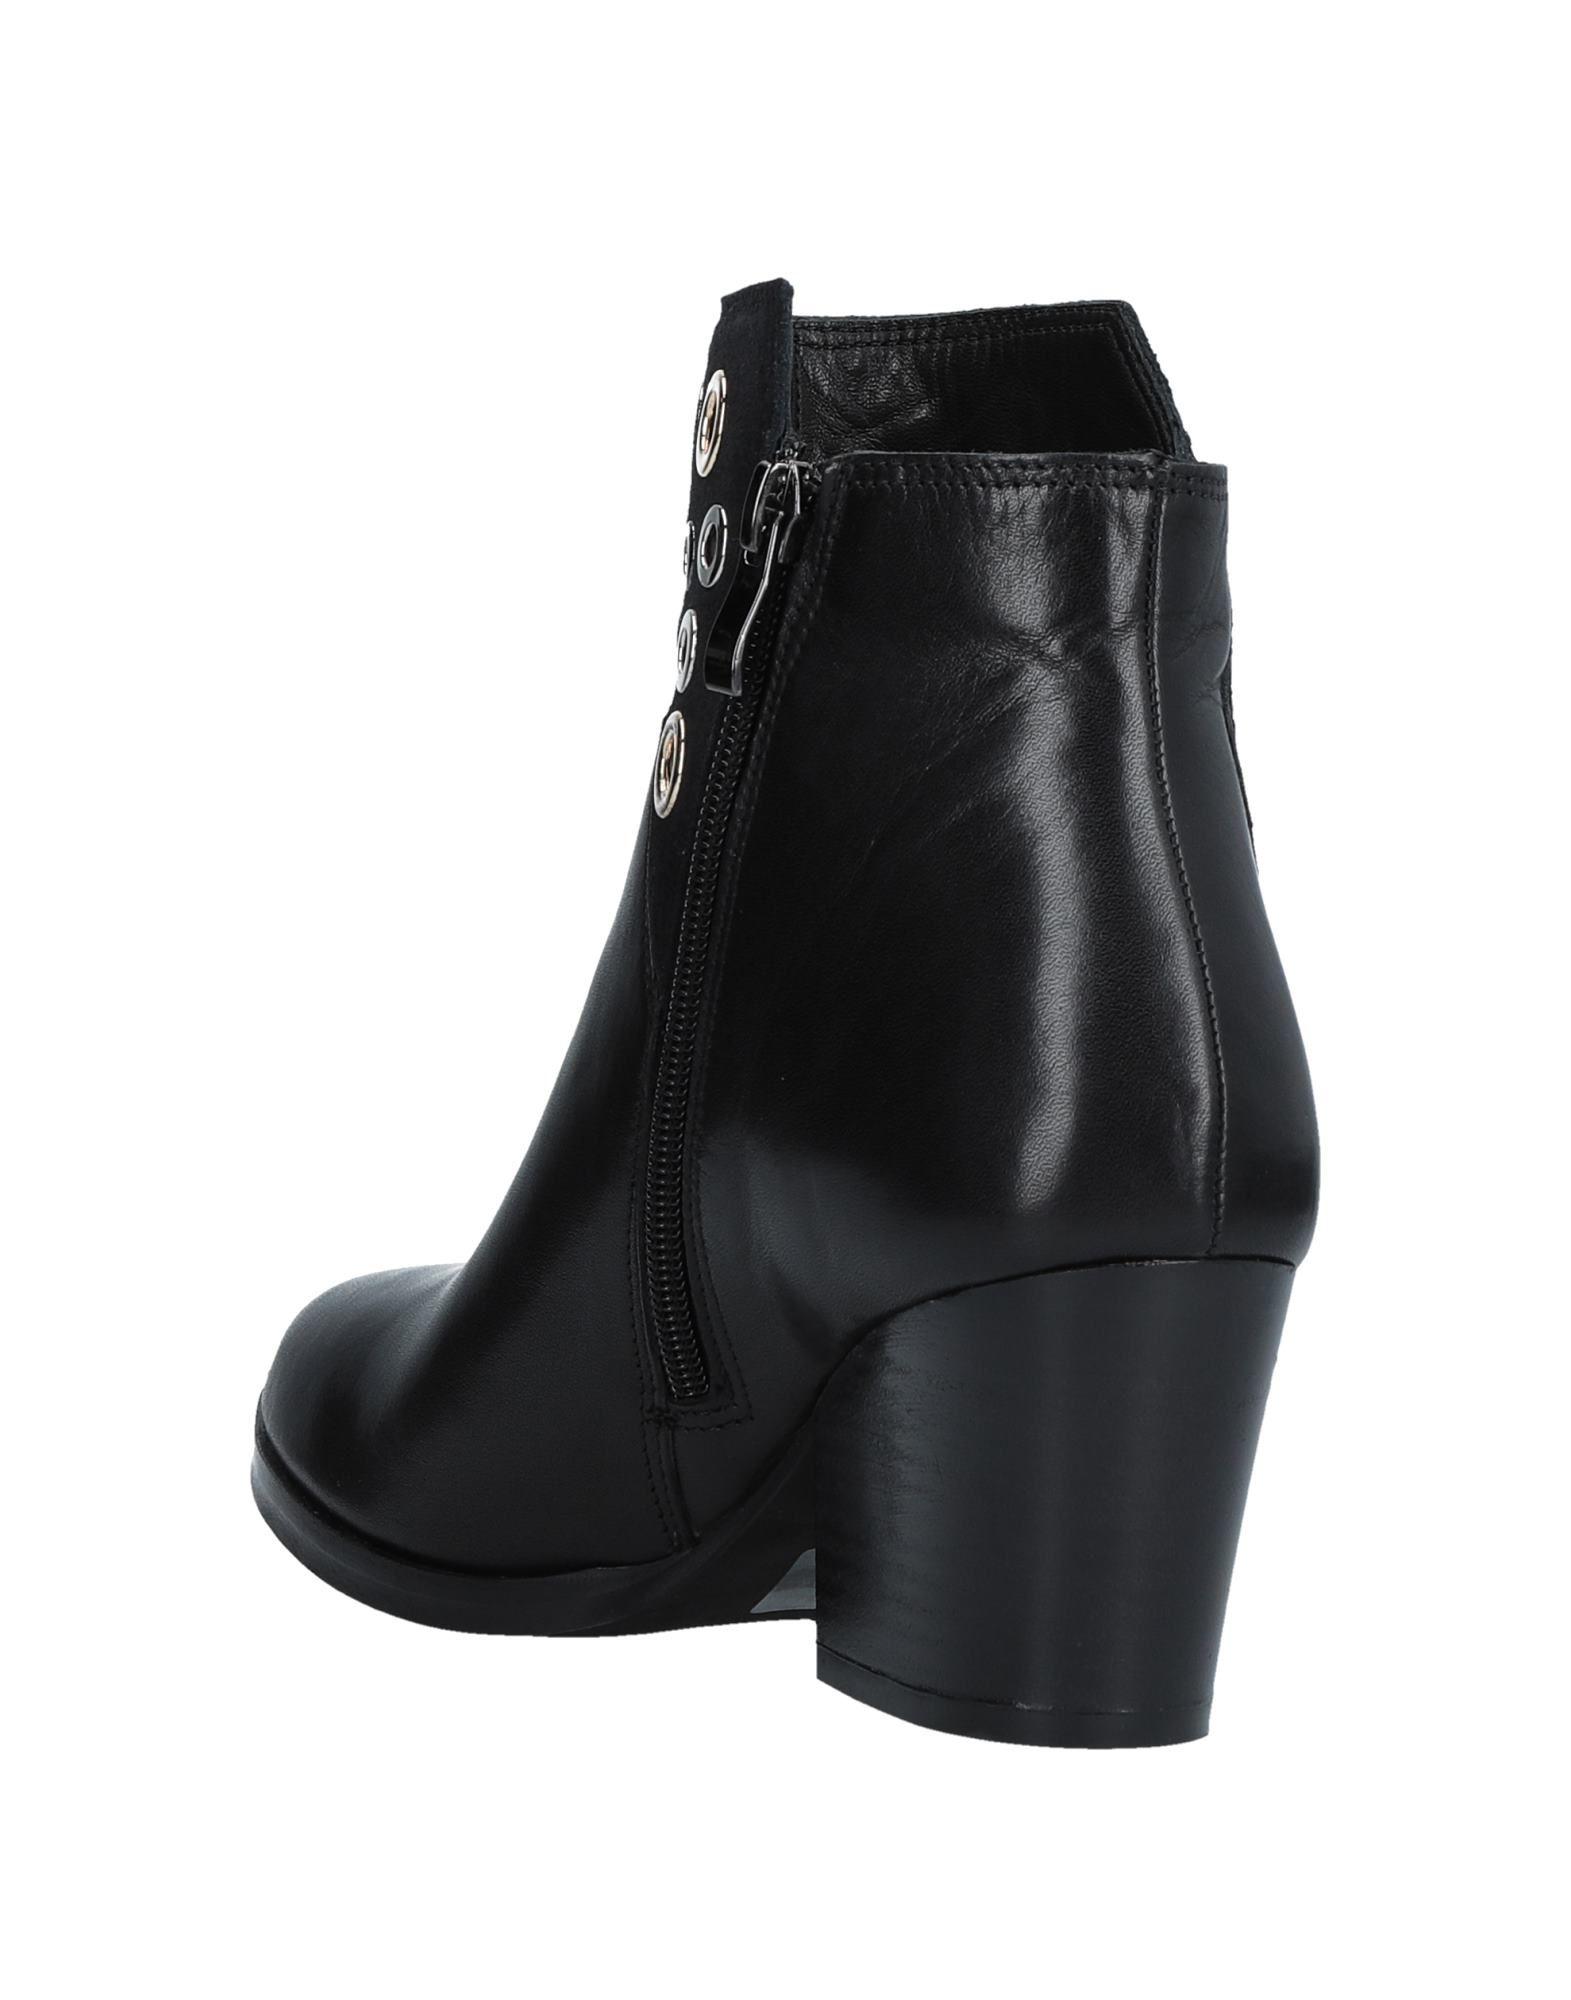 Four Five Stiefelette Damen beliebte 11539292GB Gute Qualität beliebte Damen Schuhe 9a46aa